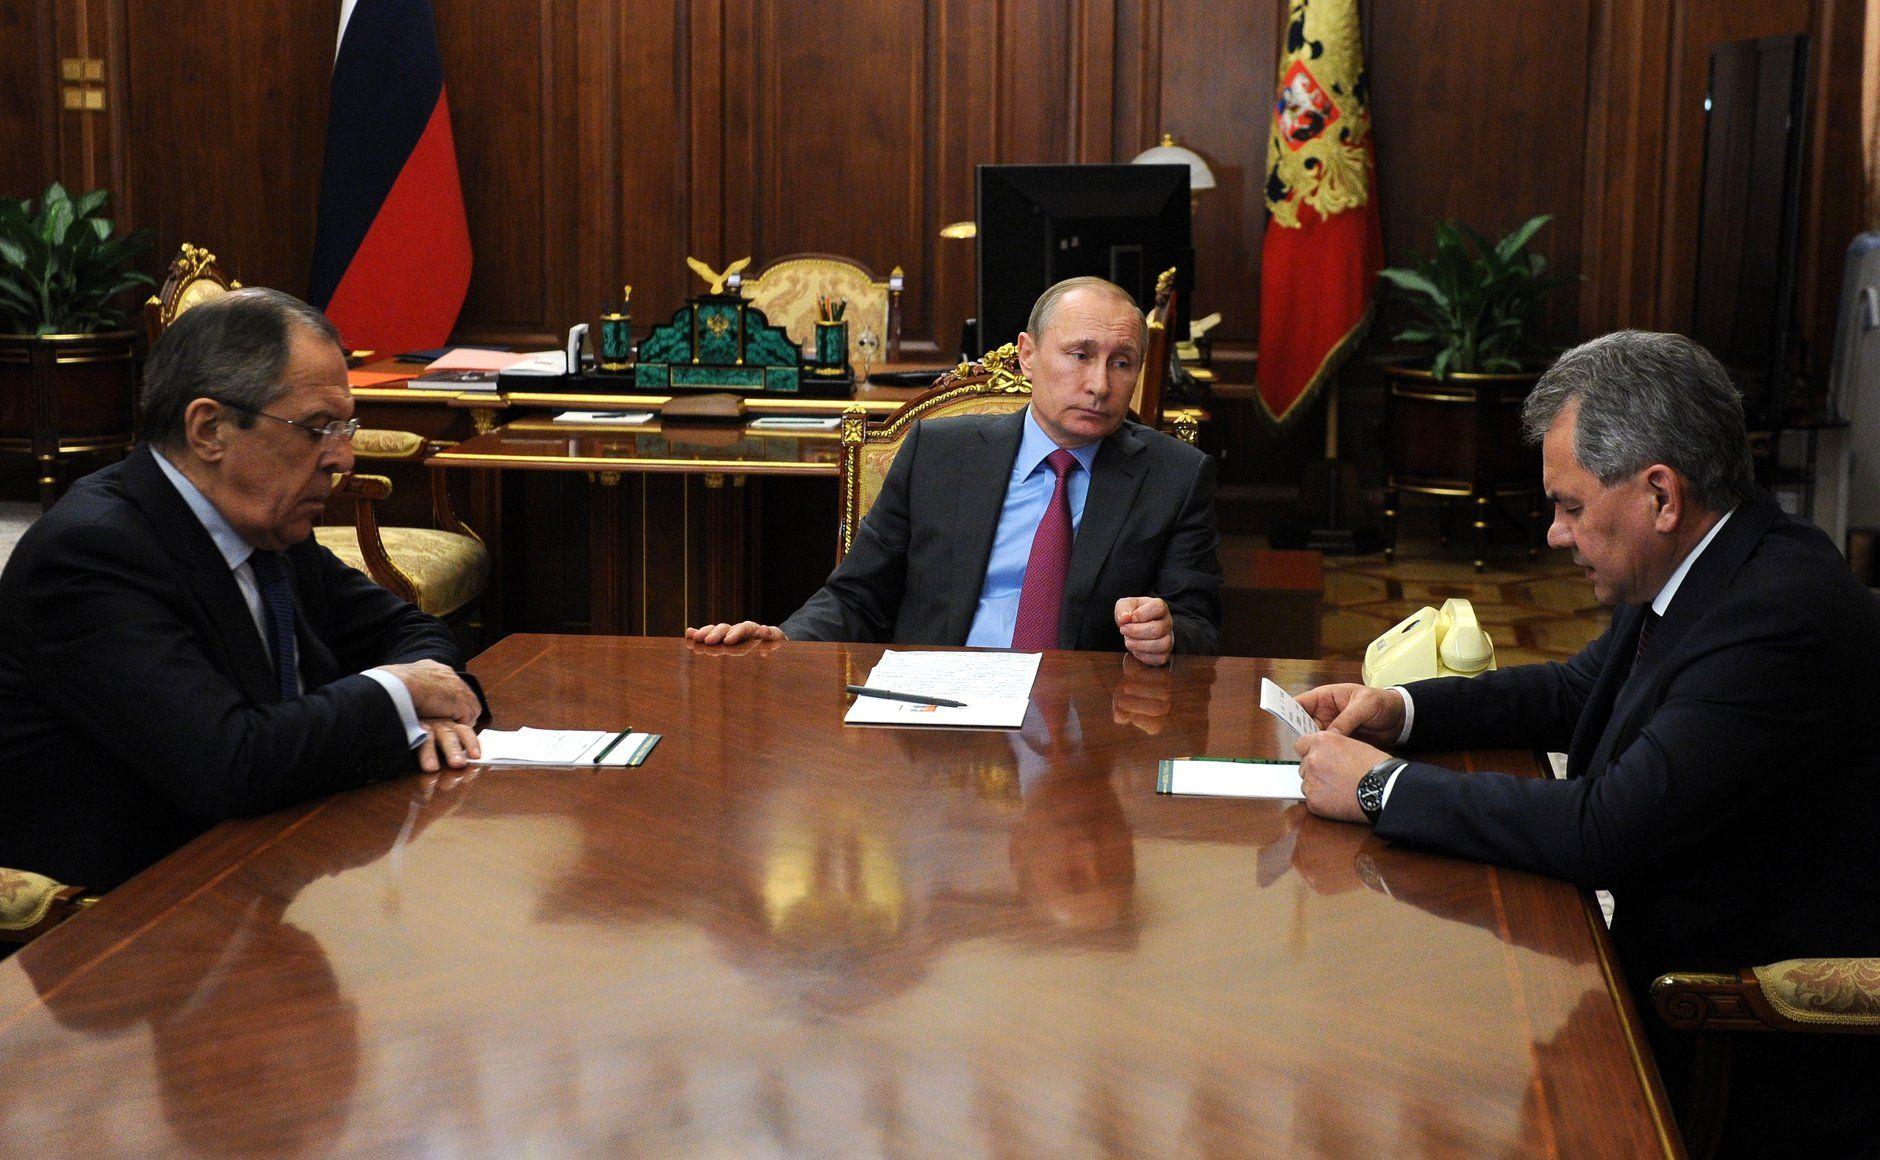 Sergei Lavrov, Vladimir Putin, Sergei Shoigu, Moscow, March 14, 2016